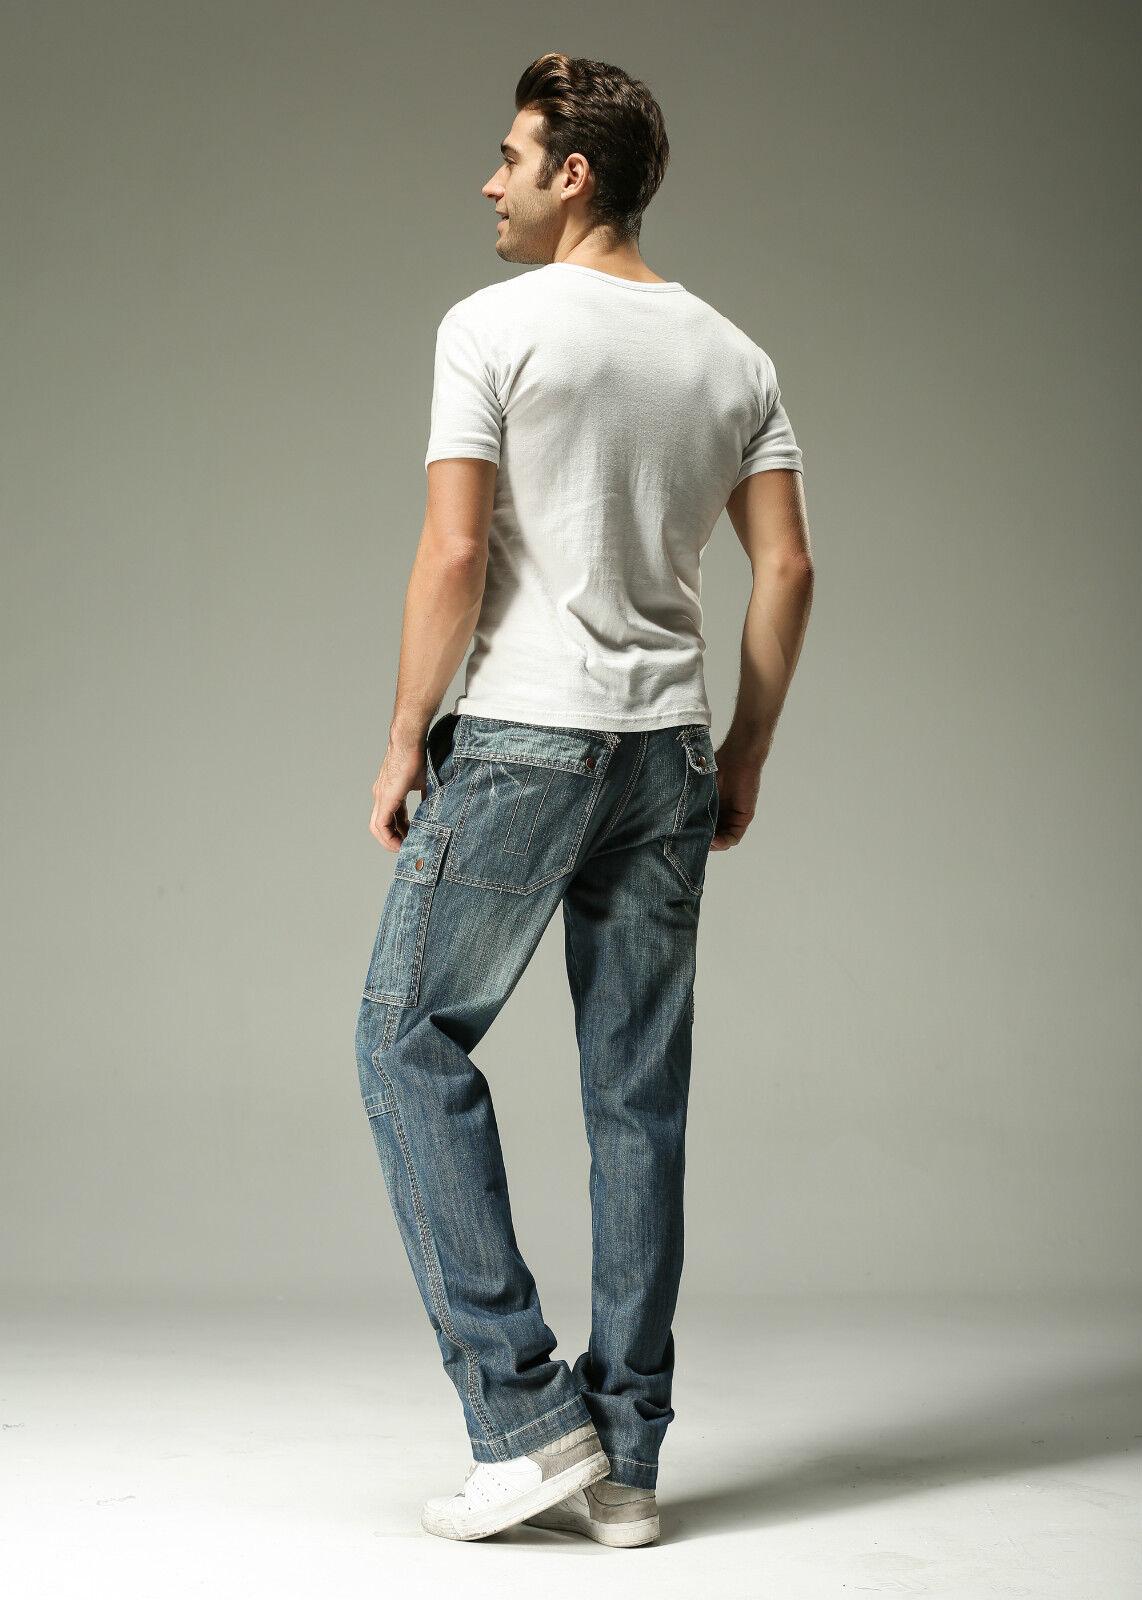 FOX JEANS Men/'s Monroe Regular Fit Straight Blue Denim Cargo Jeans SIZE 32-44